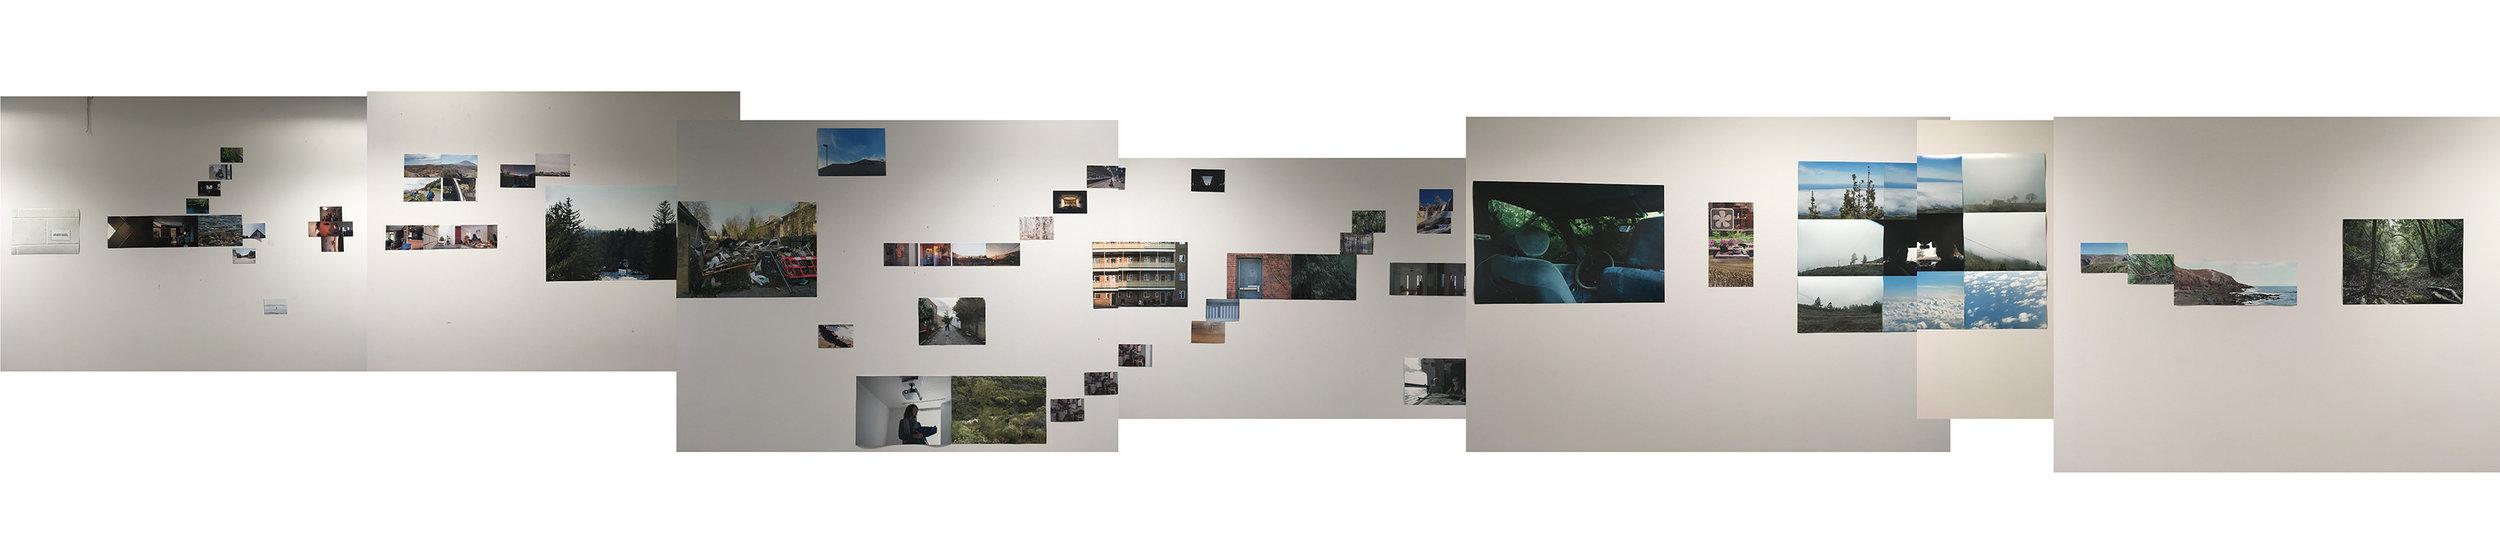 final layout - exhibition 1.jpg